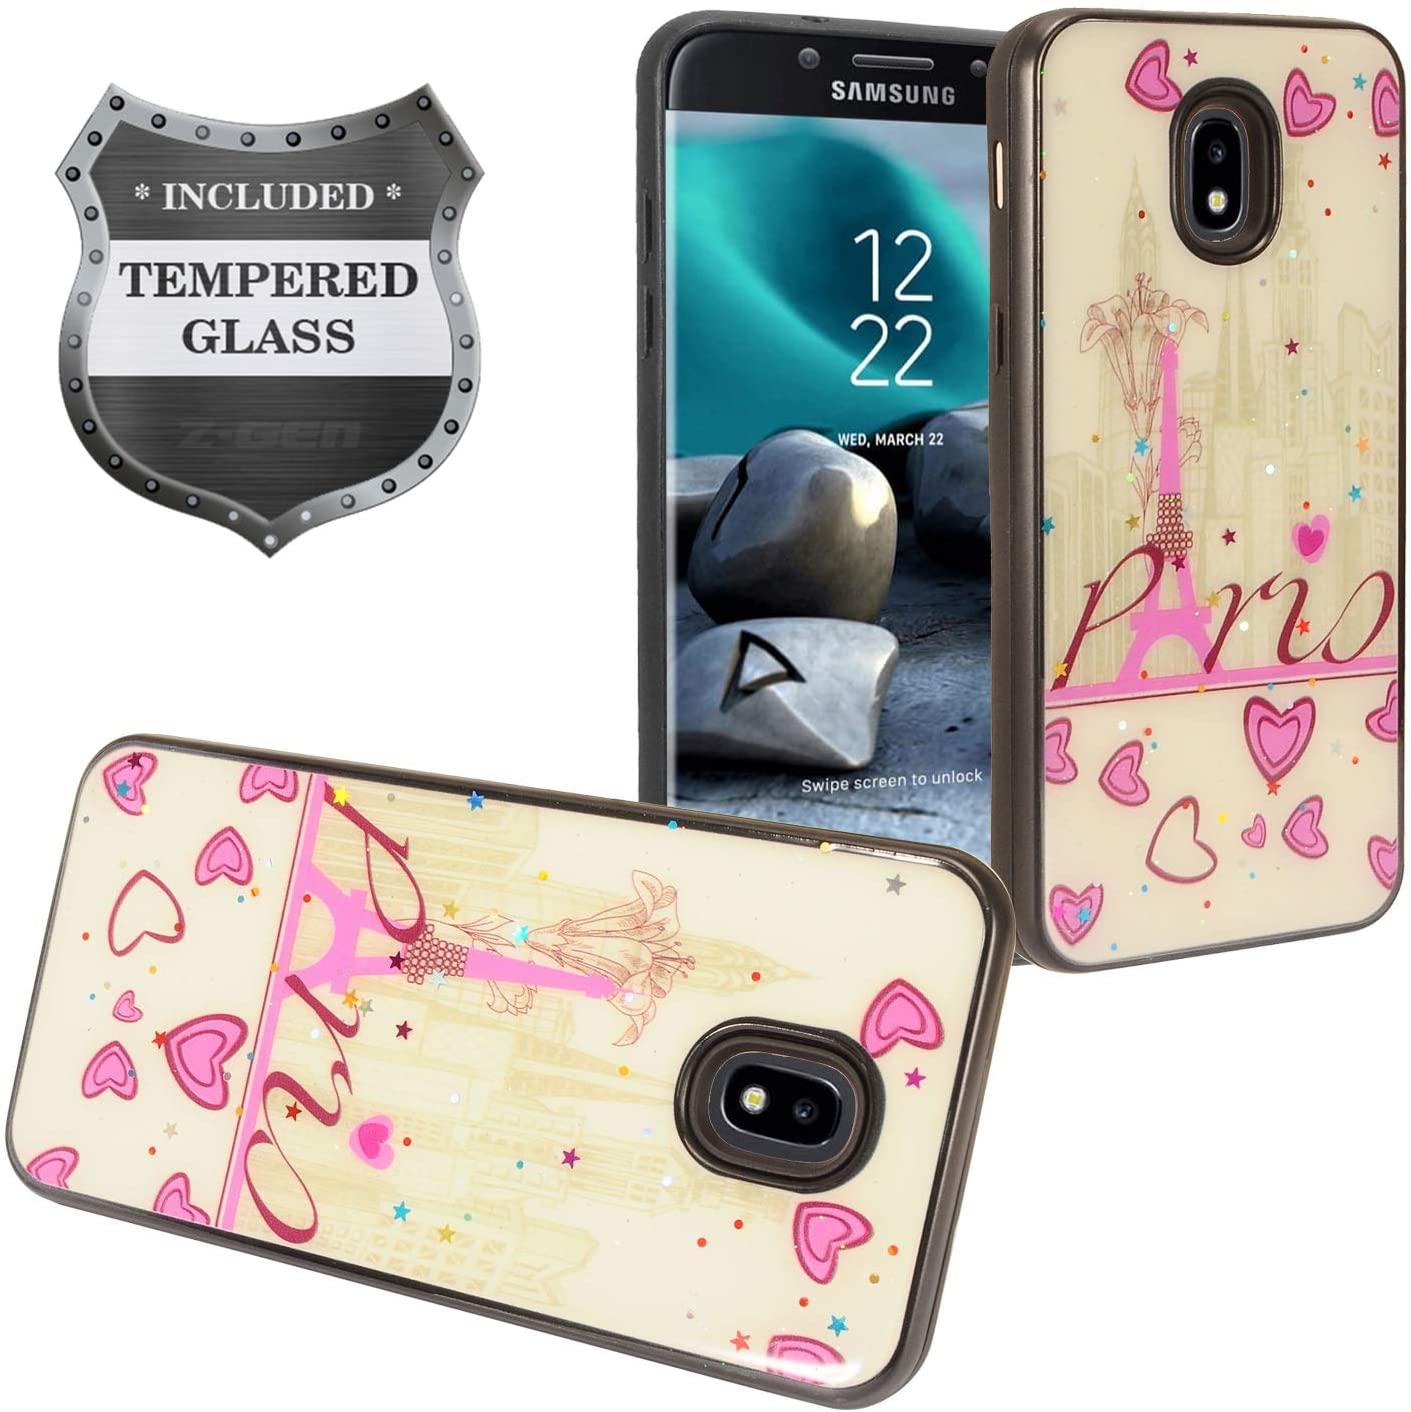 Z-GEN - Galaxy J7 2018, J7 Refine, J7 Star, J7 Crown, J7 Aura, J7 Top, J7 V J7V 2nd Gen J737 - Hybrid Image Phone Case for Samsung + Tempered Glass Screen Protector - DJ1 Heart/Tower